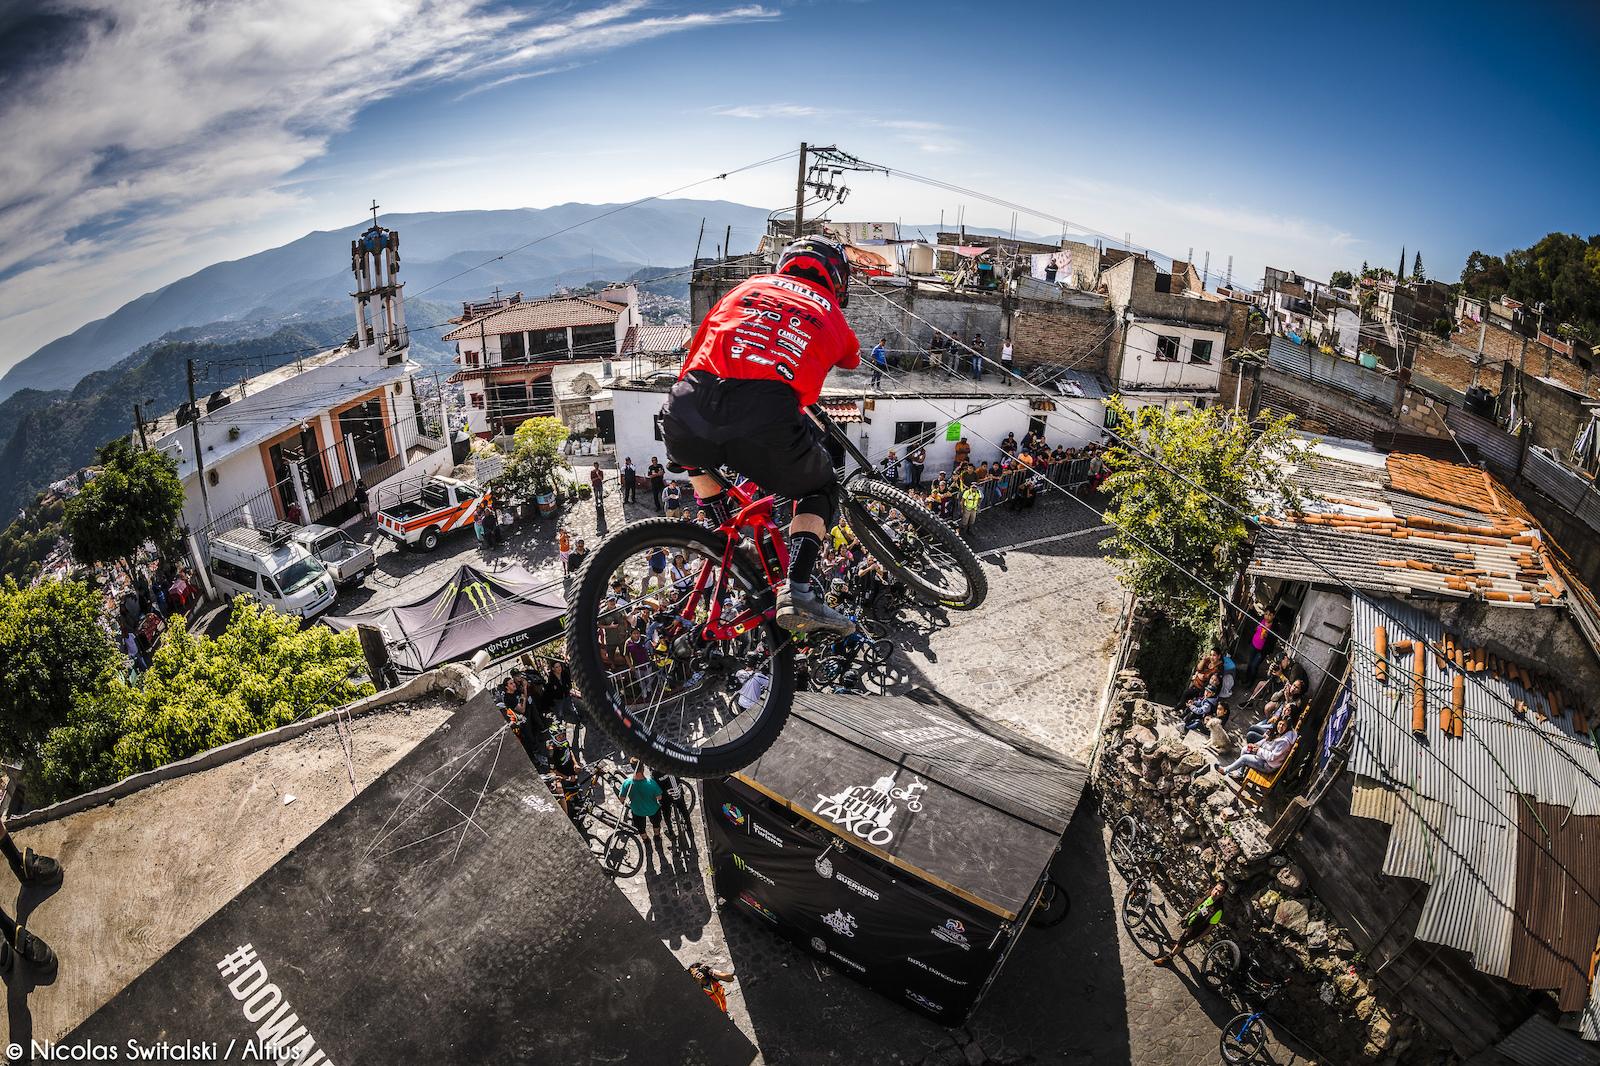 5d31393c388 Photo Epic: 2018 DownTaxco Urban DH Race - Pinkbike